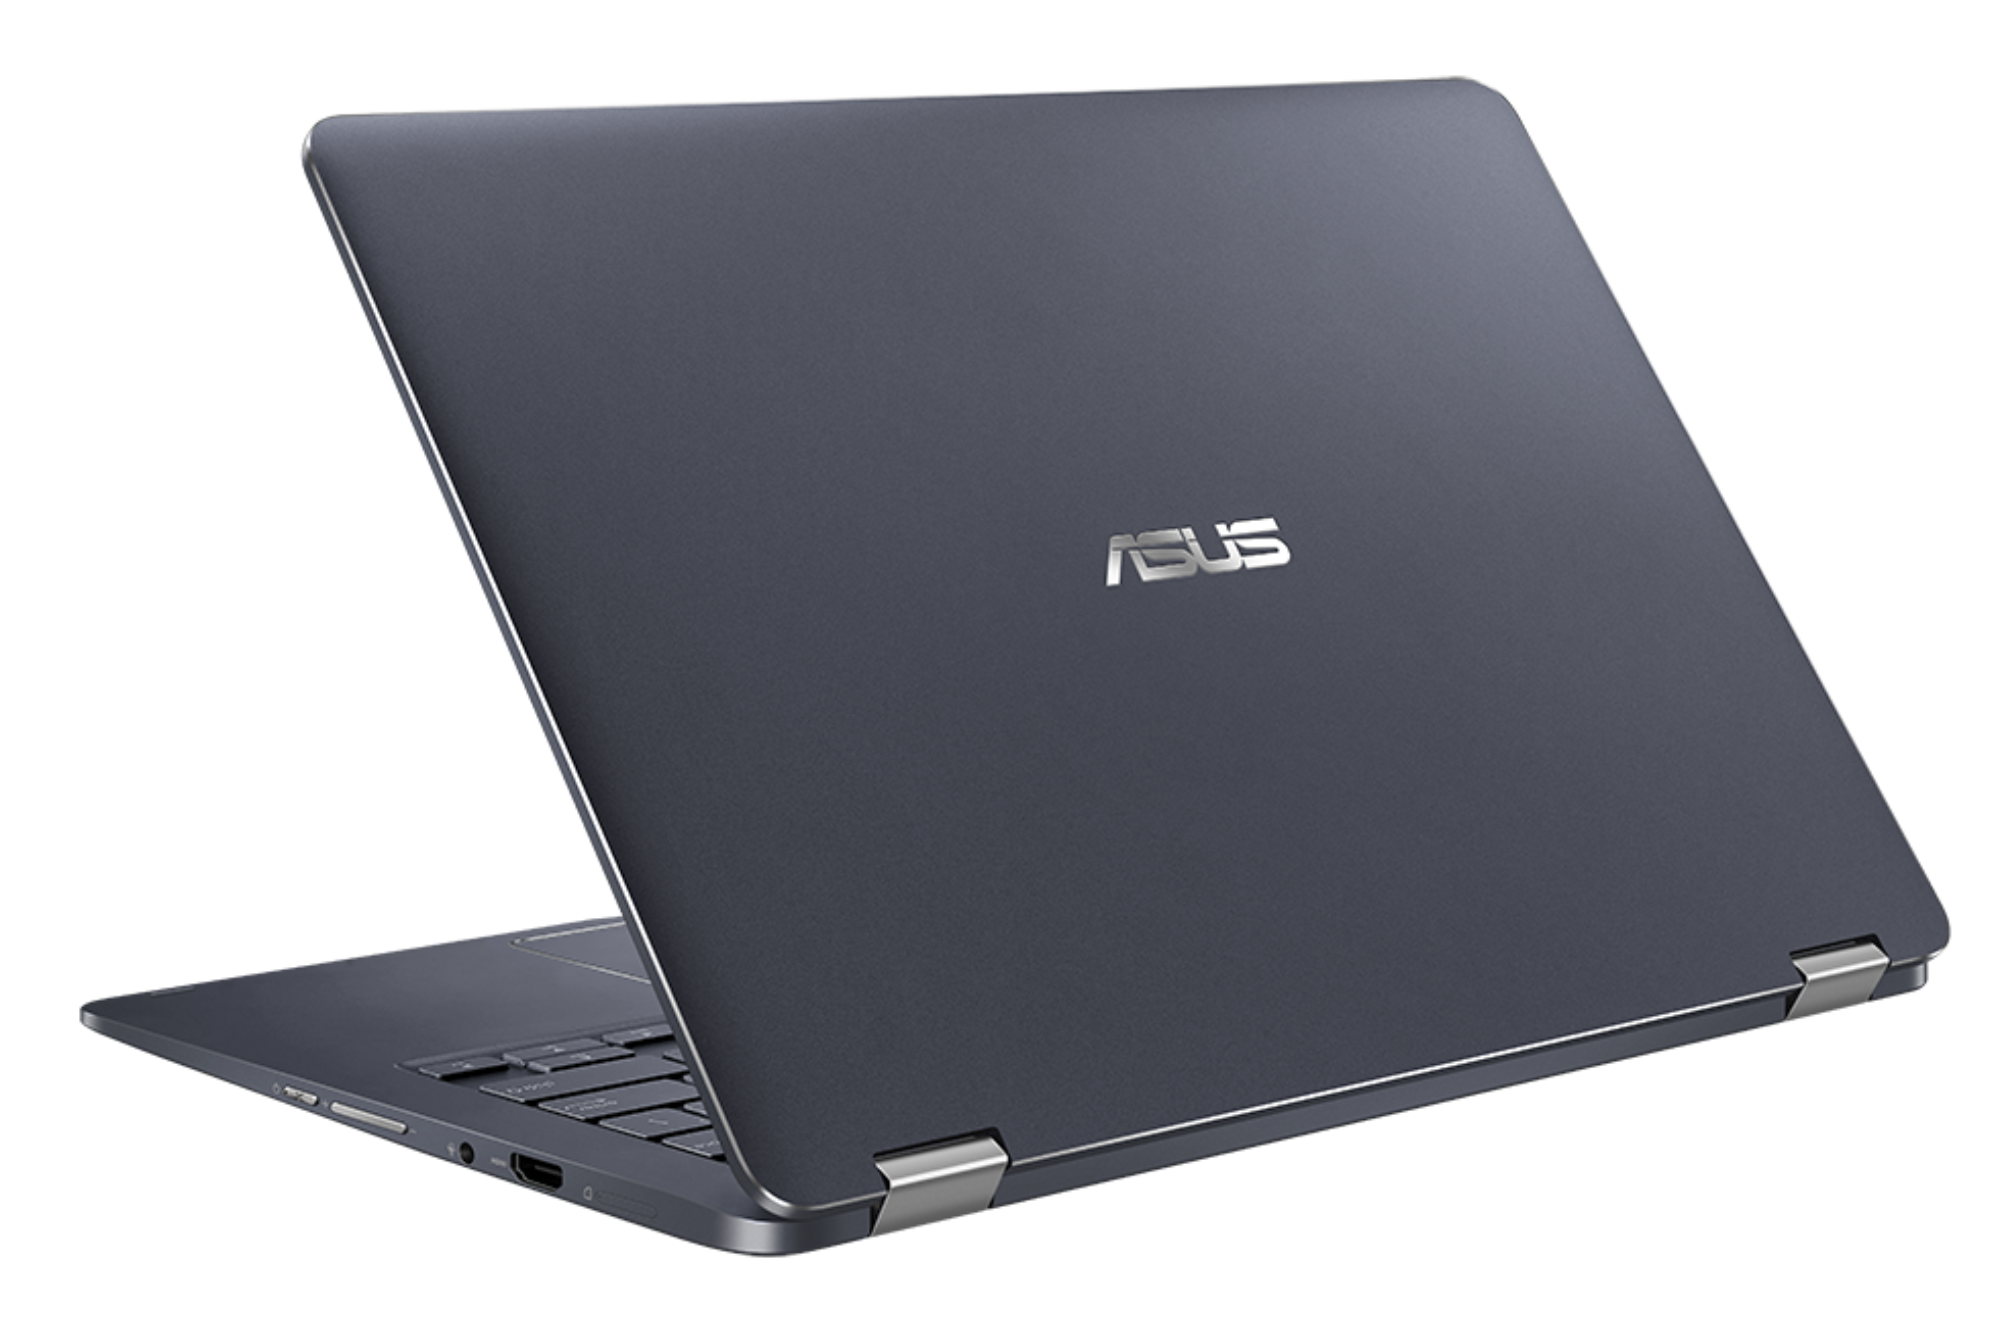 Smarte ressurser Dette er de første PC-ene med Snapdragon 835 – og de har saftig NQ-09